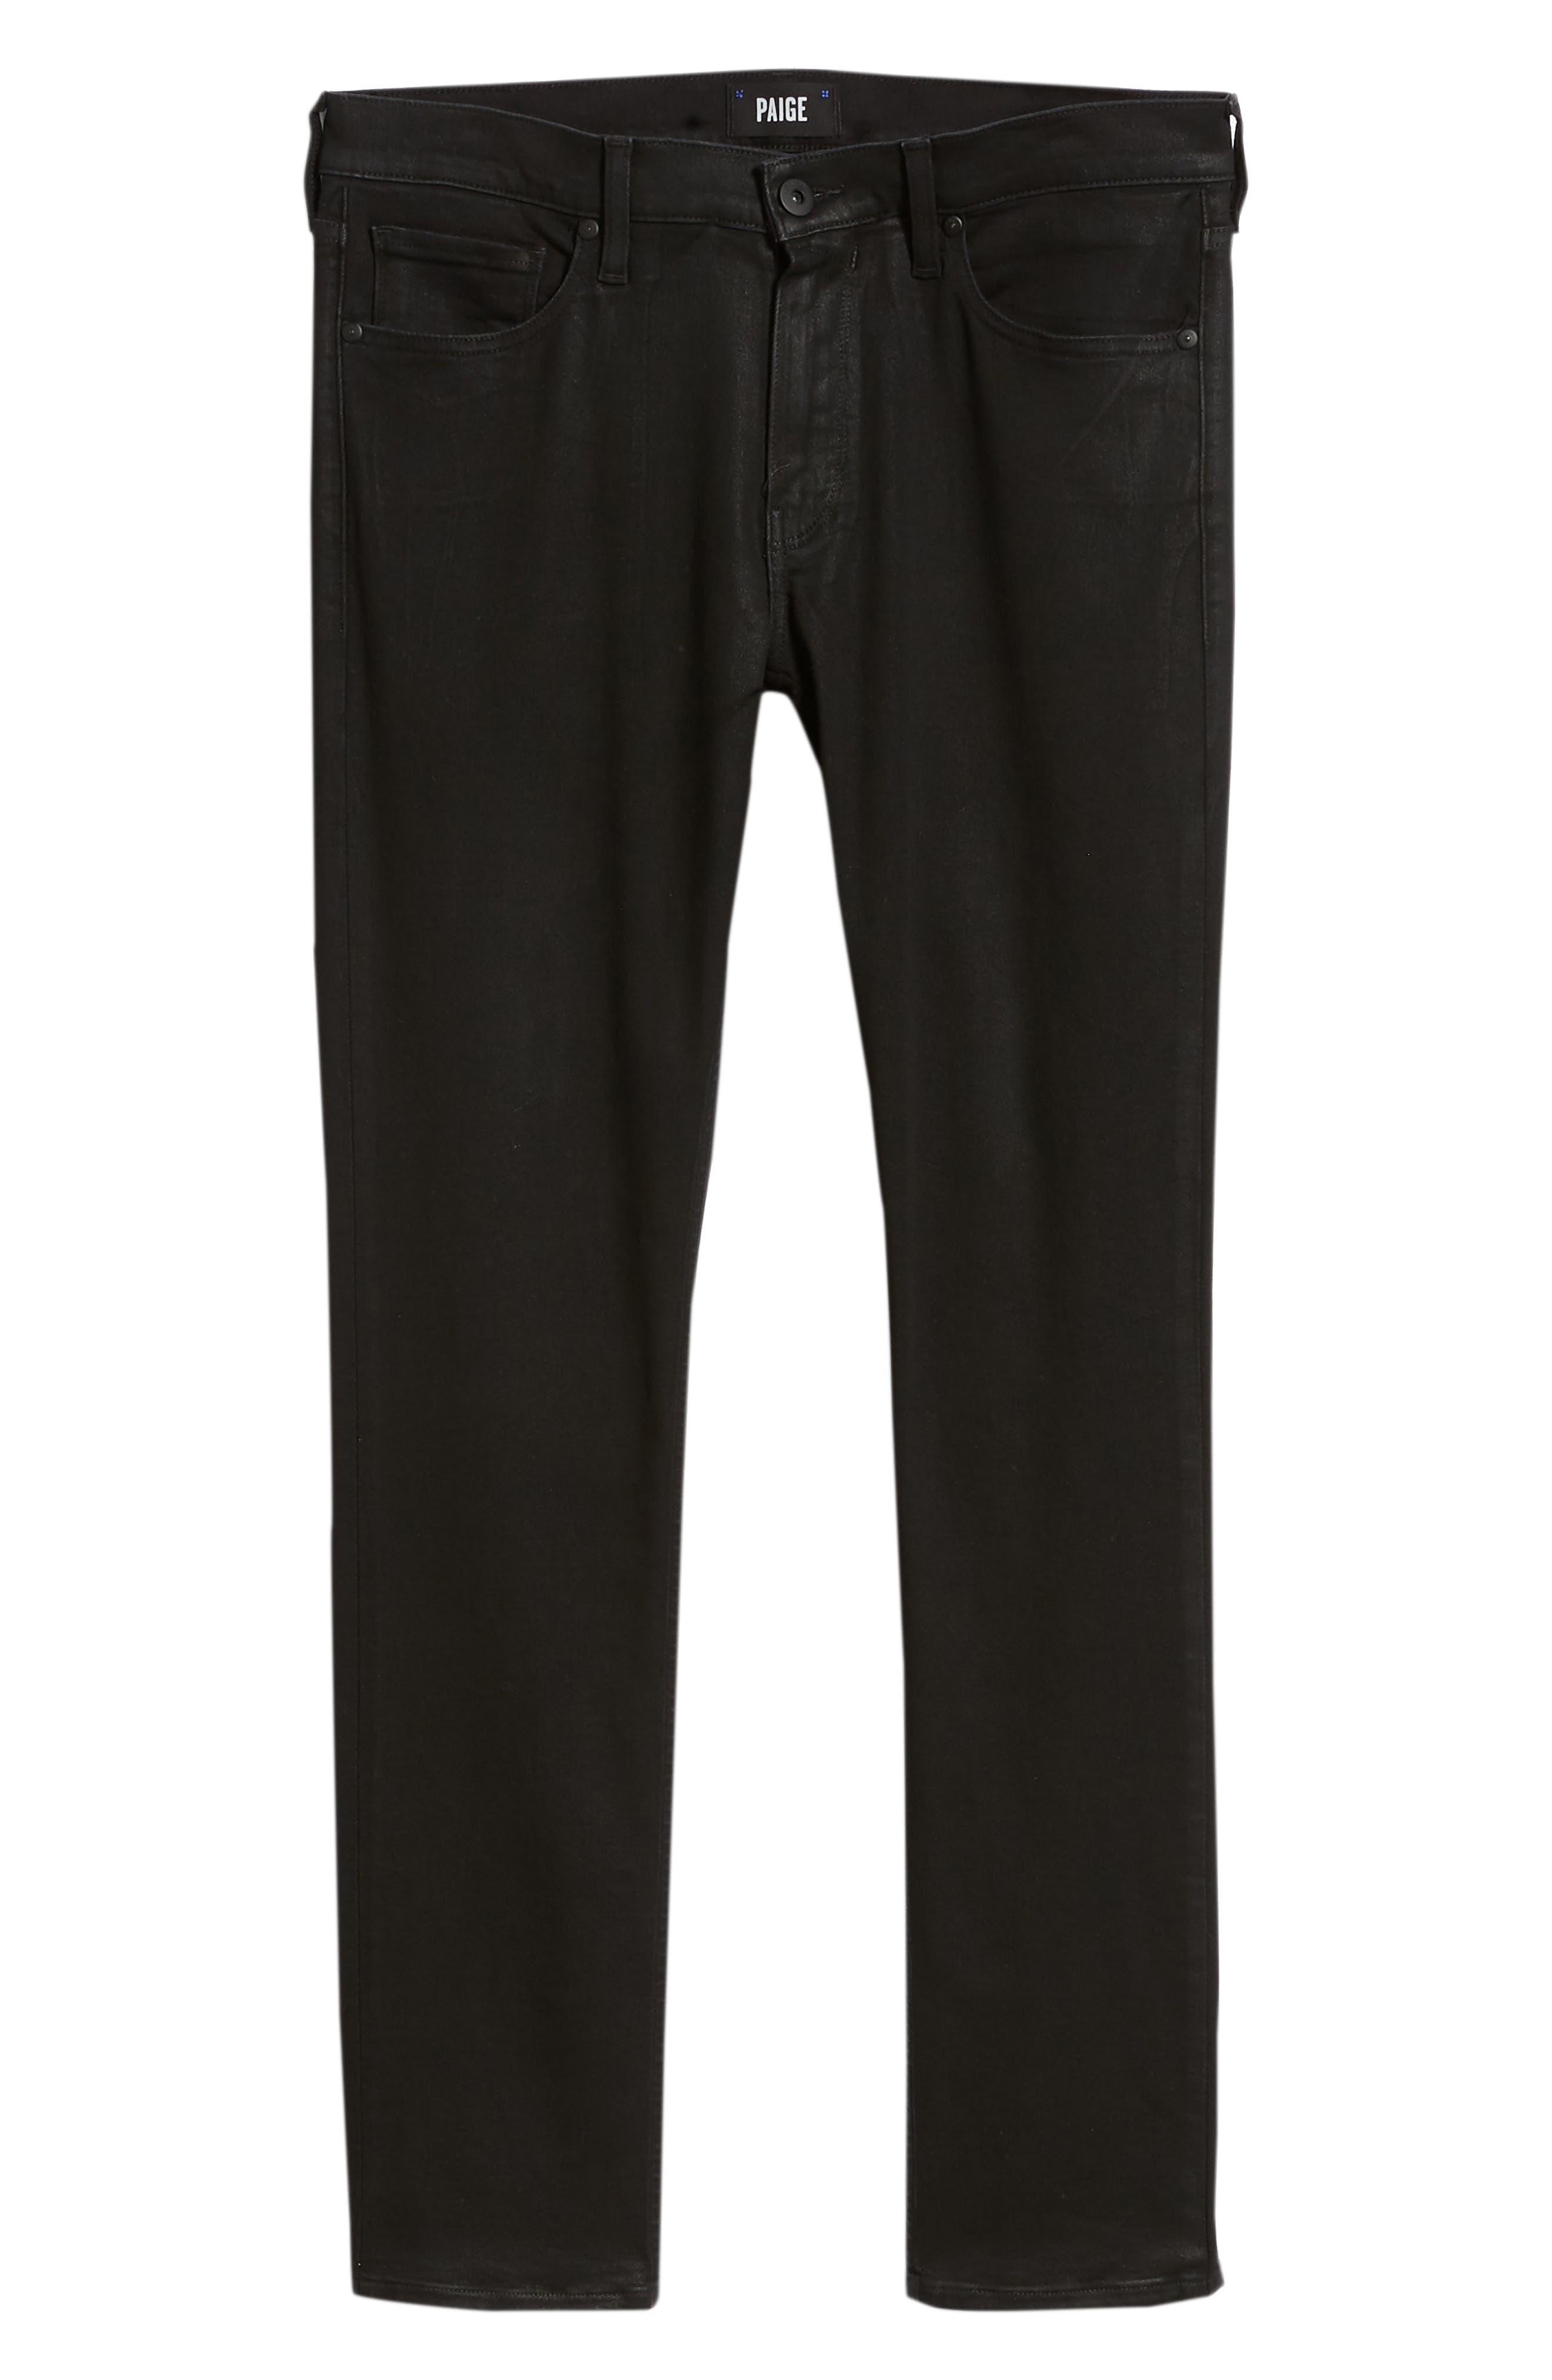 Transcend - Croft Skinny Fit Jeans,                             Alternate thumbnail 6, color,                             400